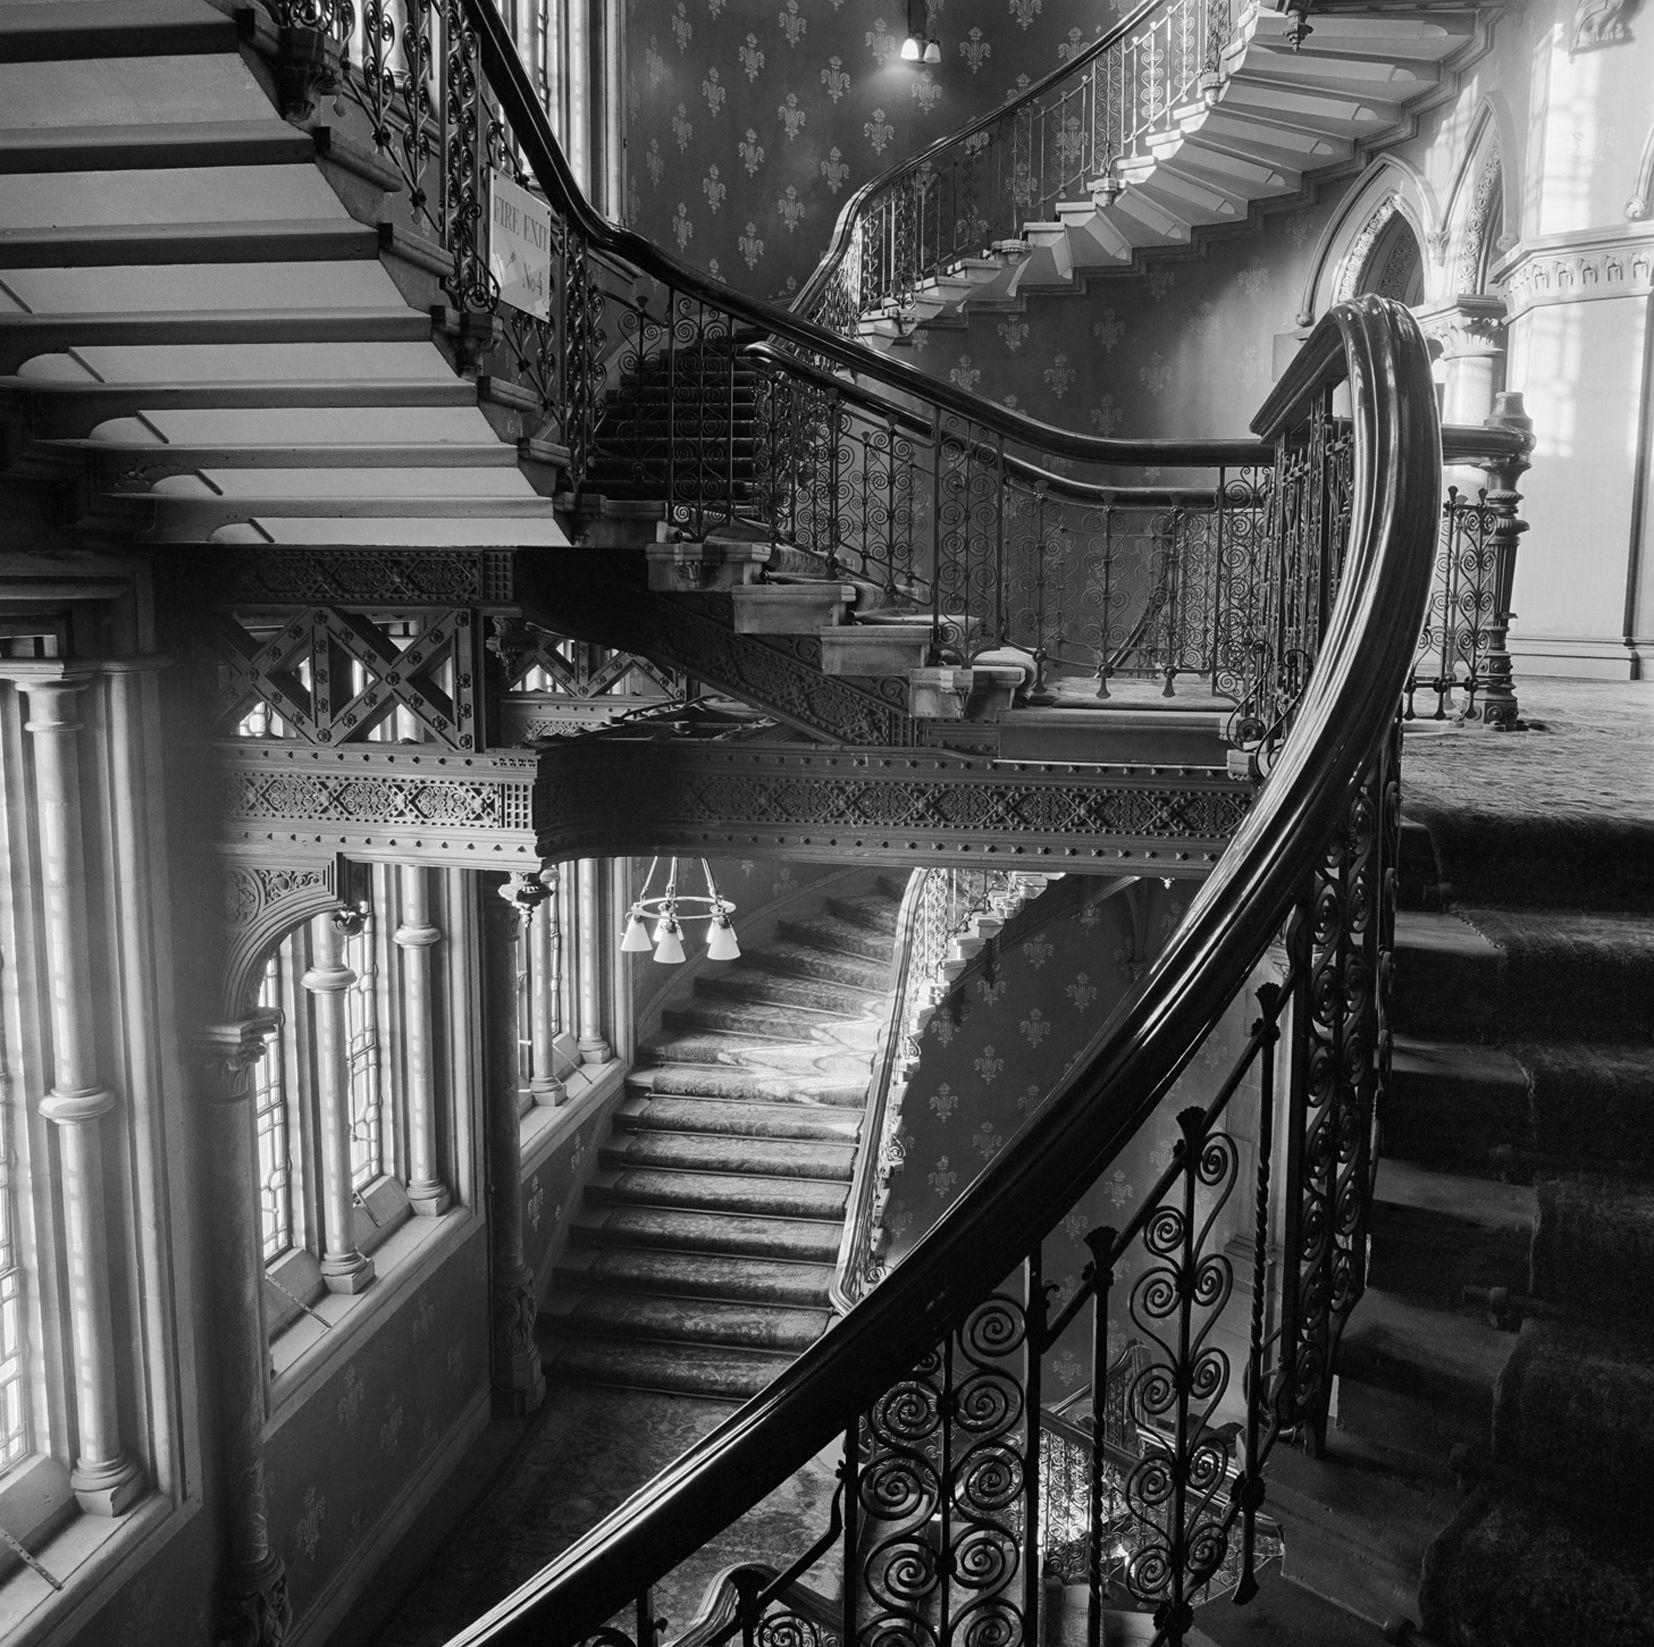 #Victorian #Steampunk #London #Abandoned